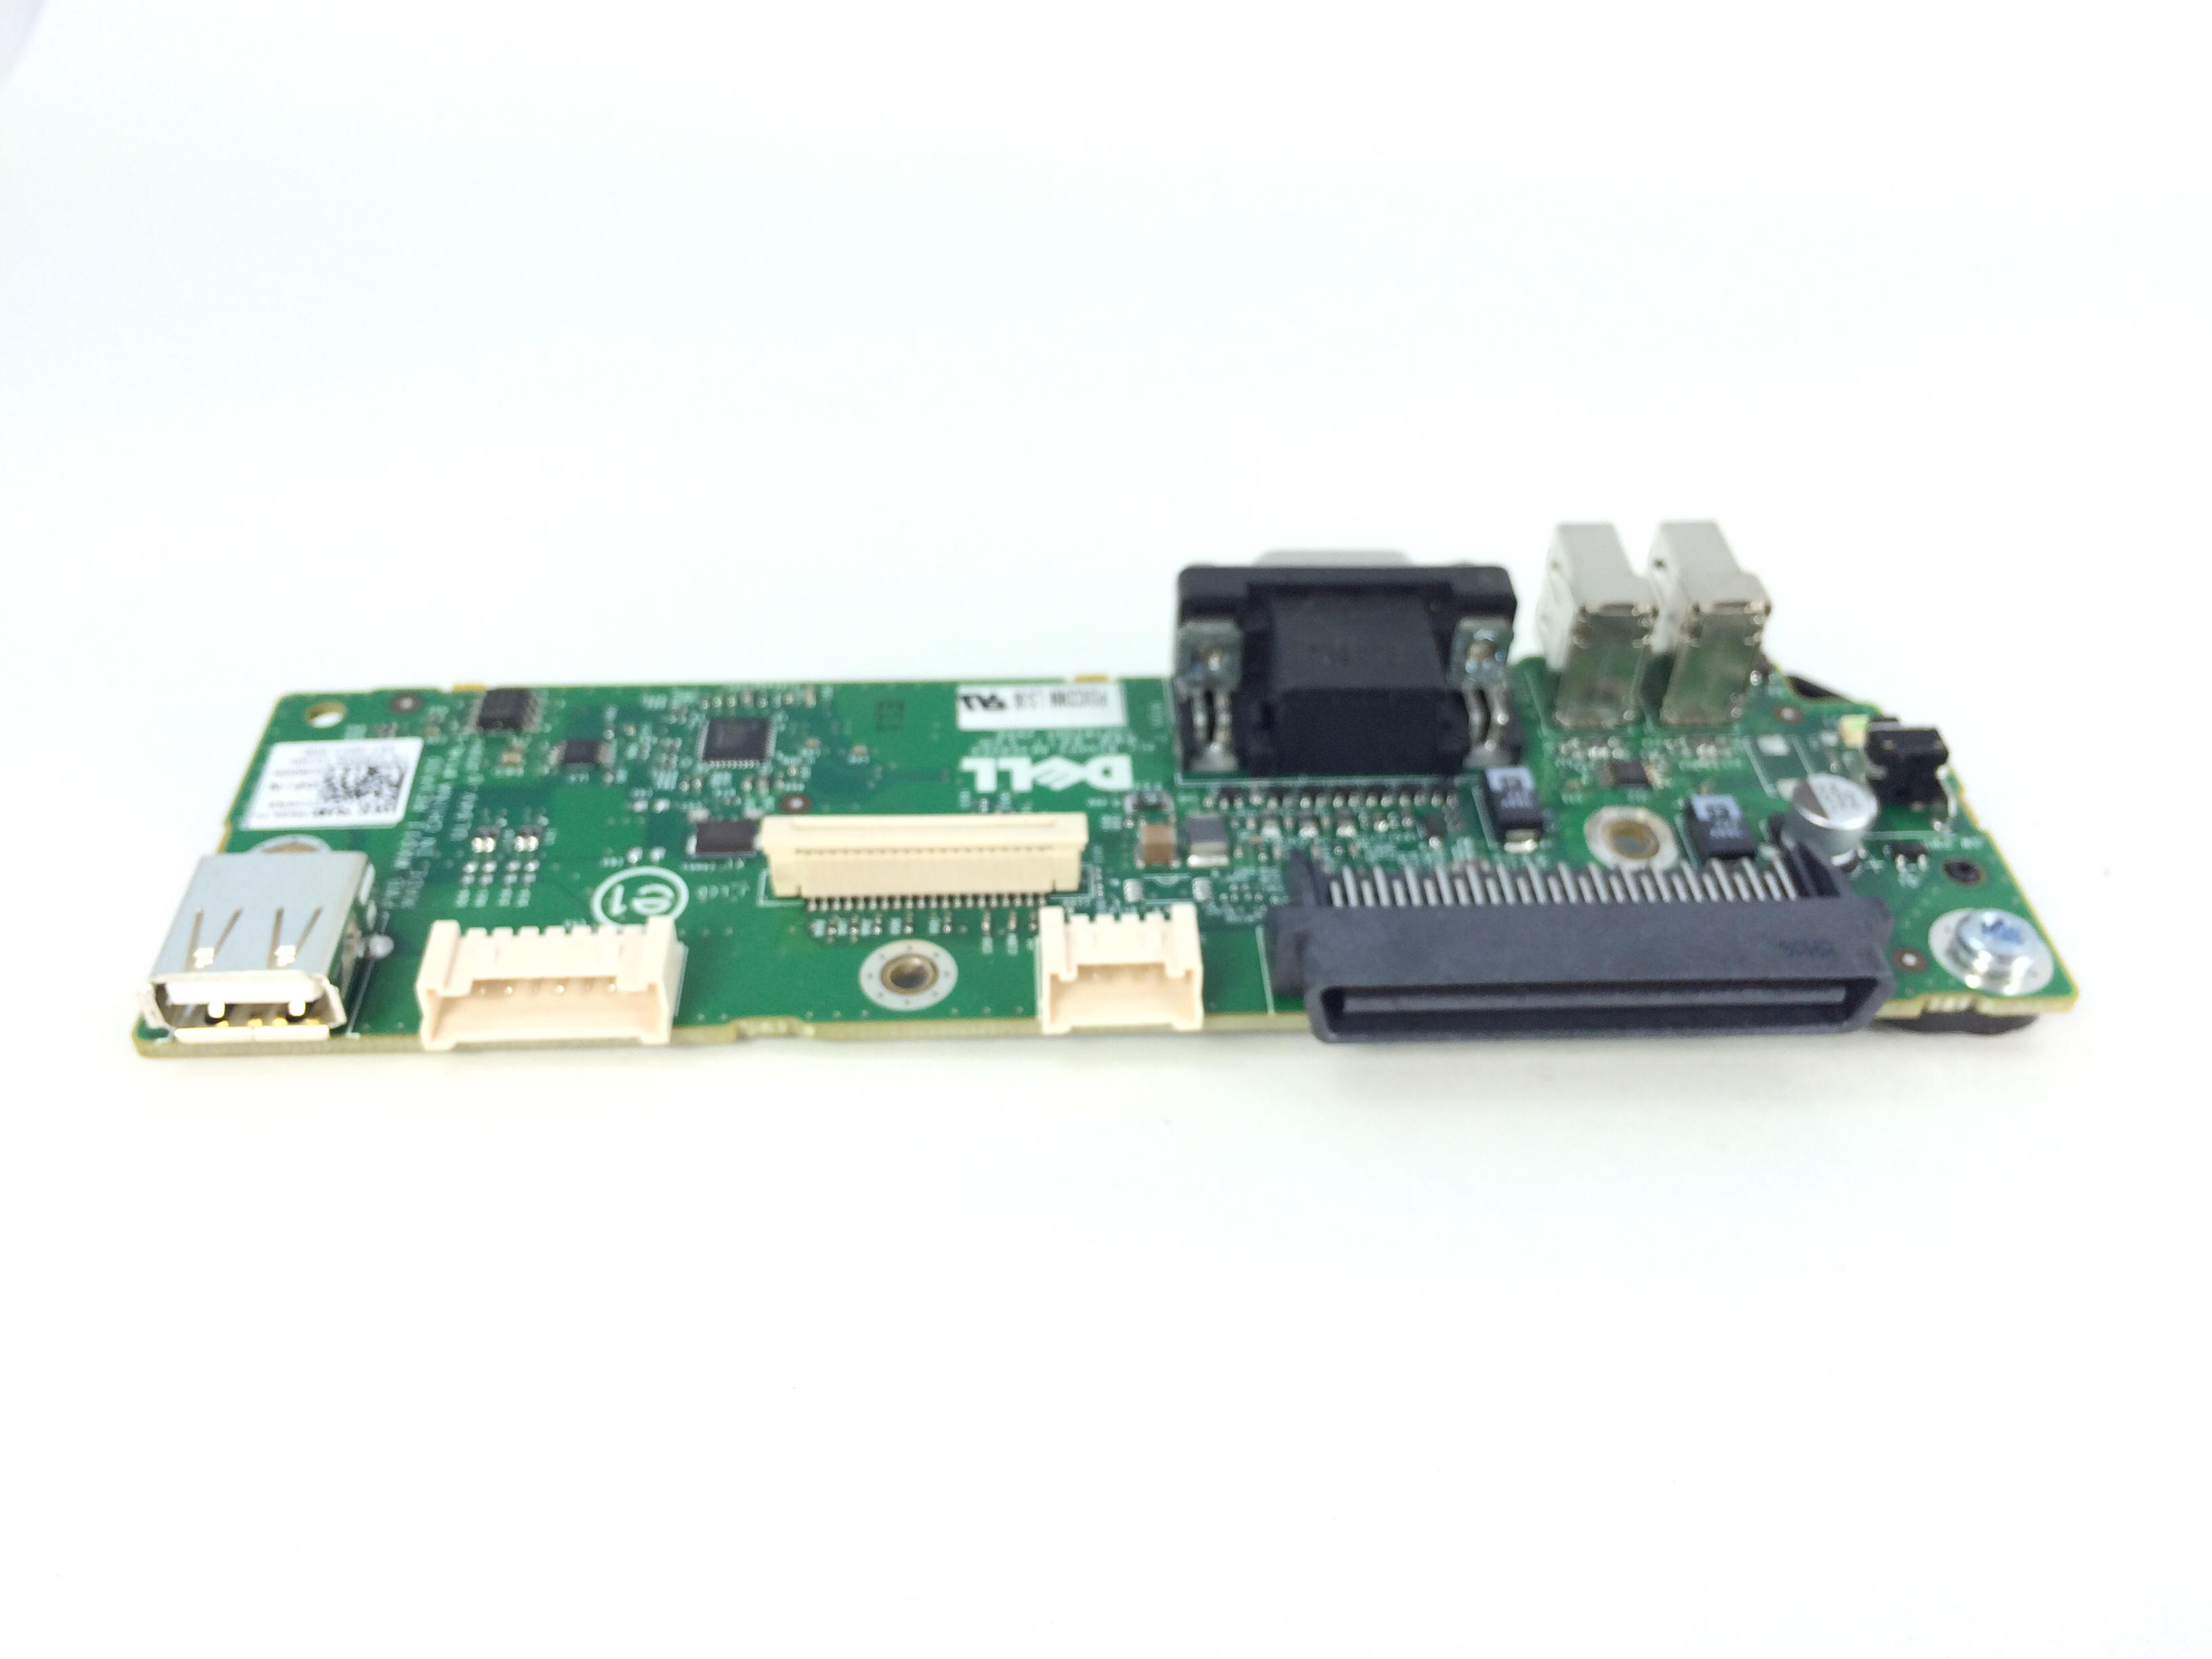 Dell PowerEdge R710 USB/VGA I/O Control Panel (J800M)